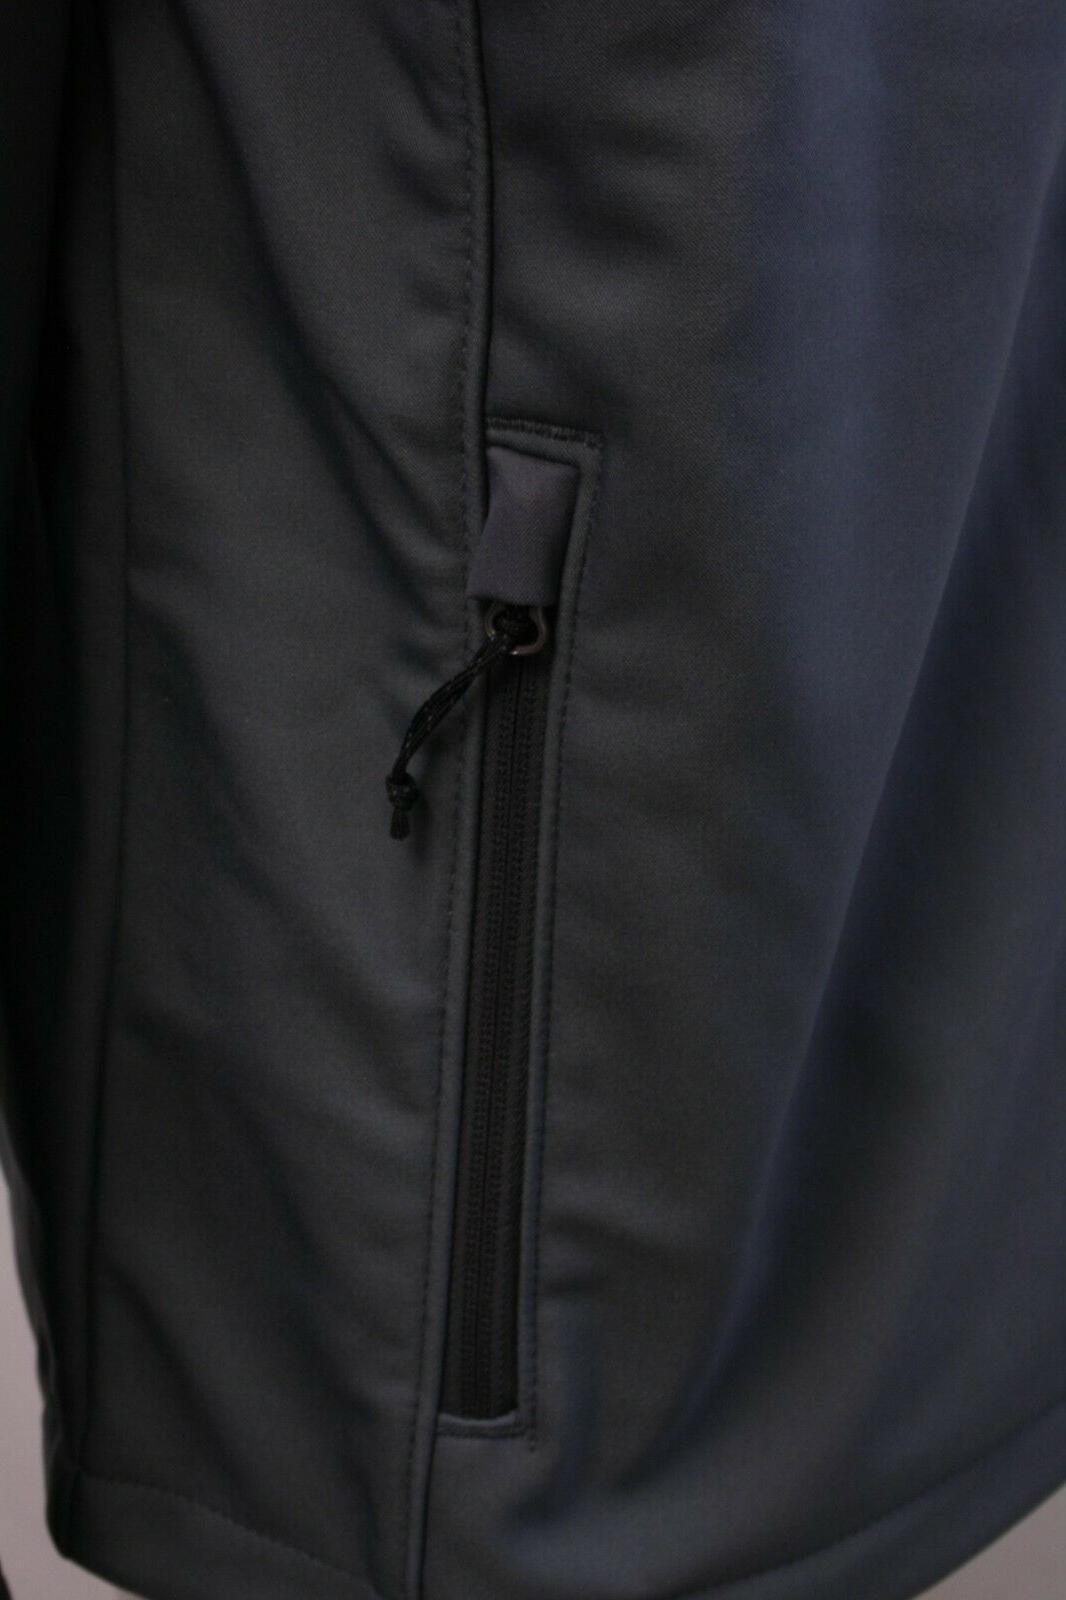 Columbia Men's Graphite Ascender Water Resistant Up Jacket